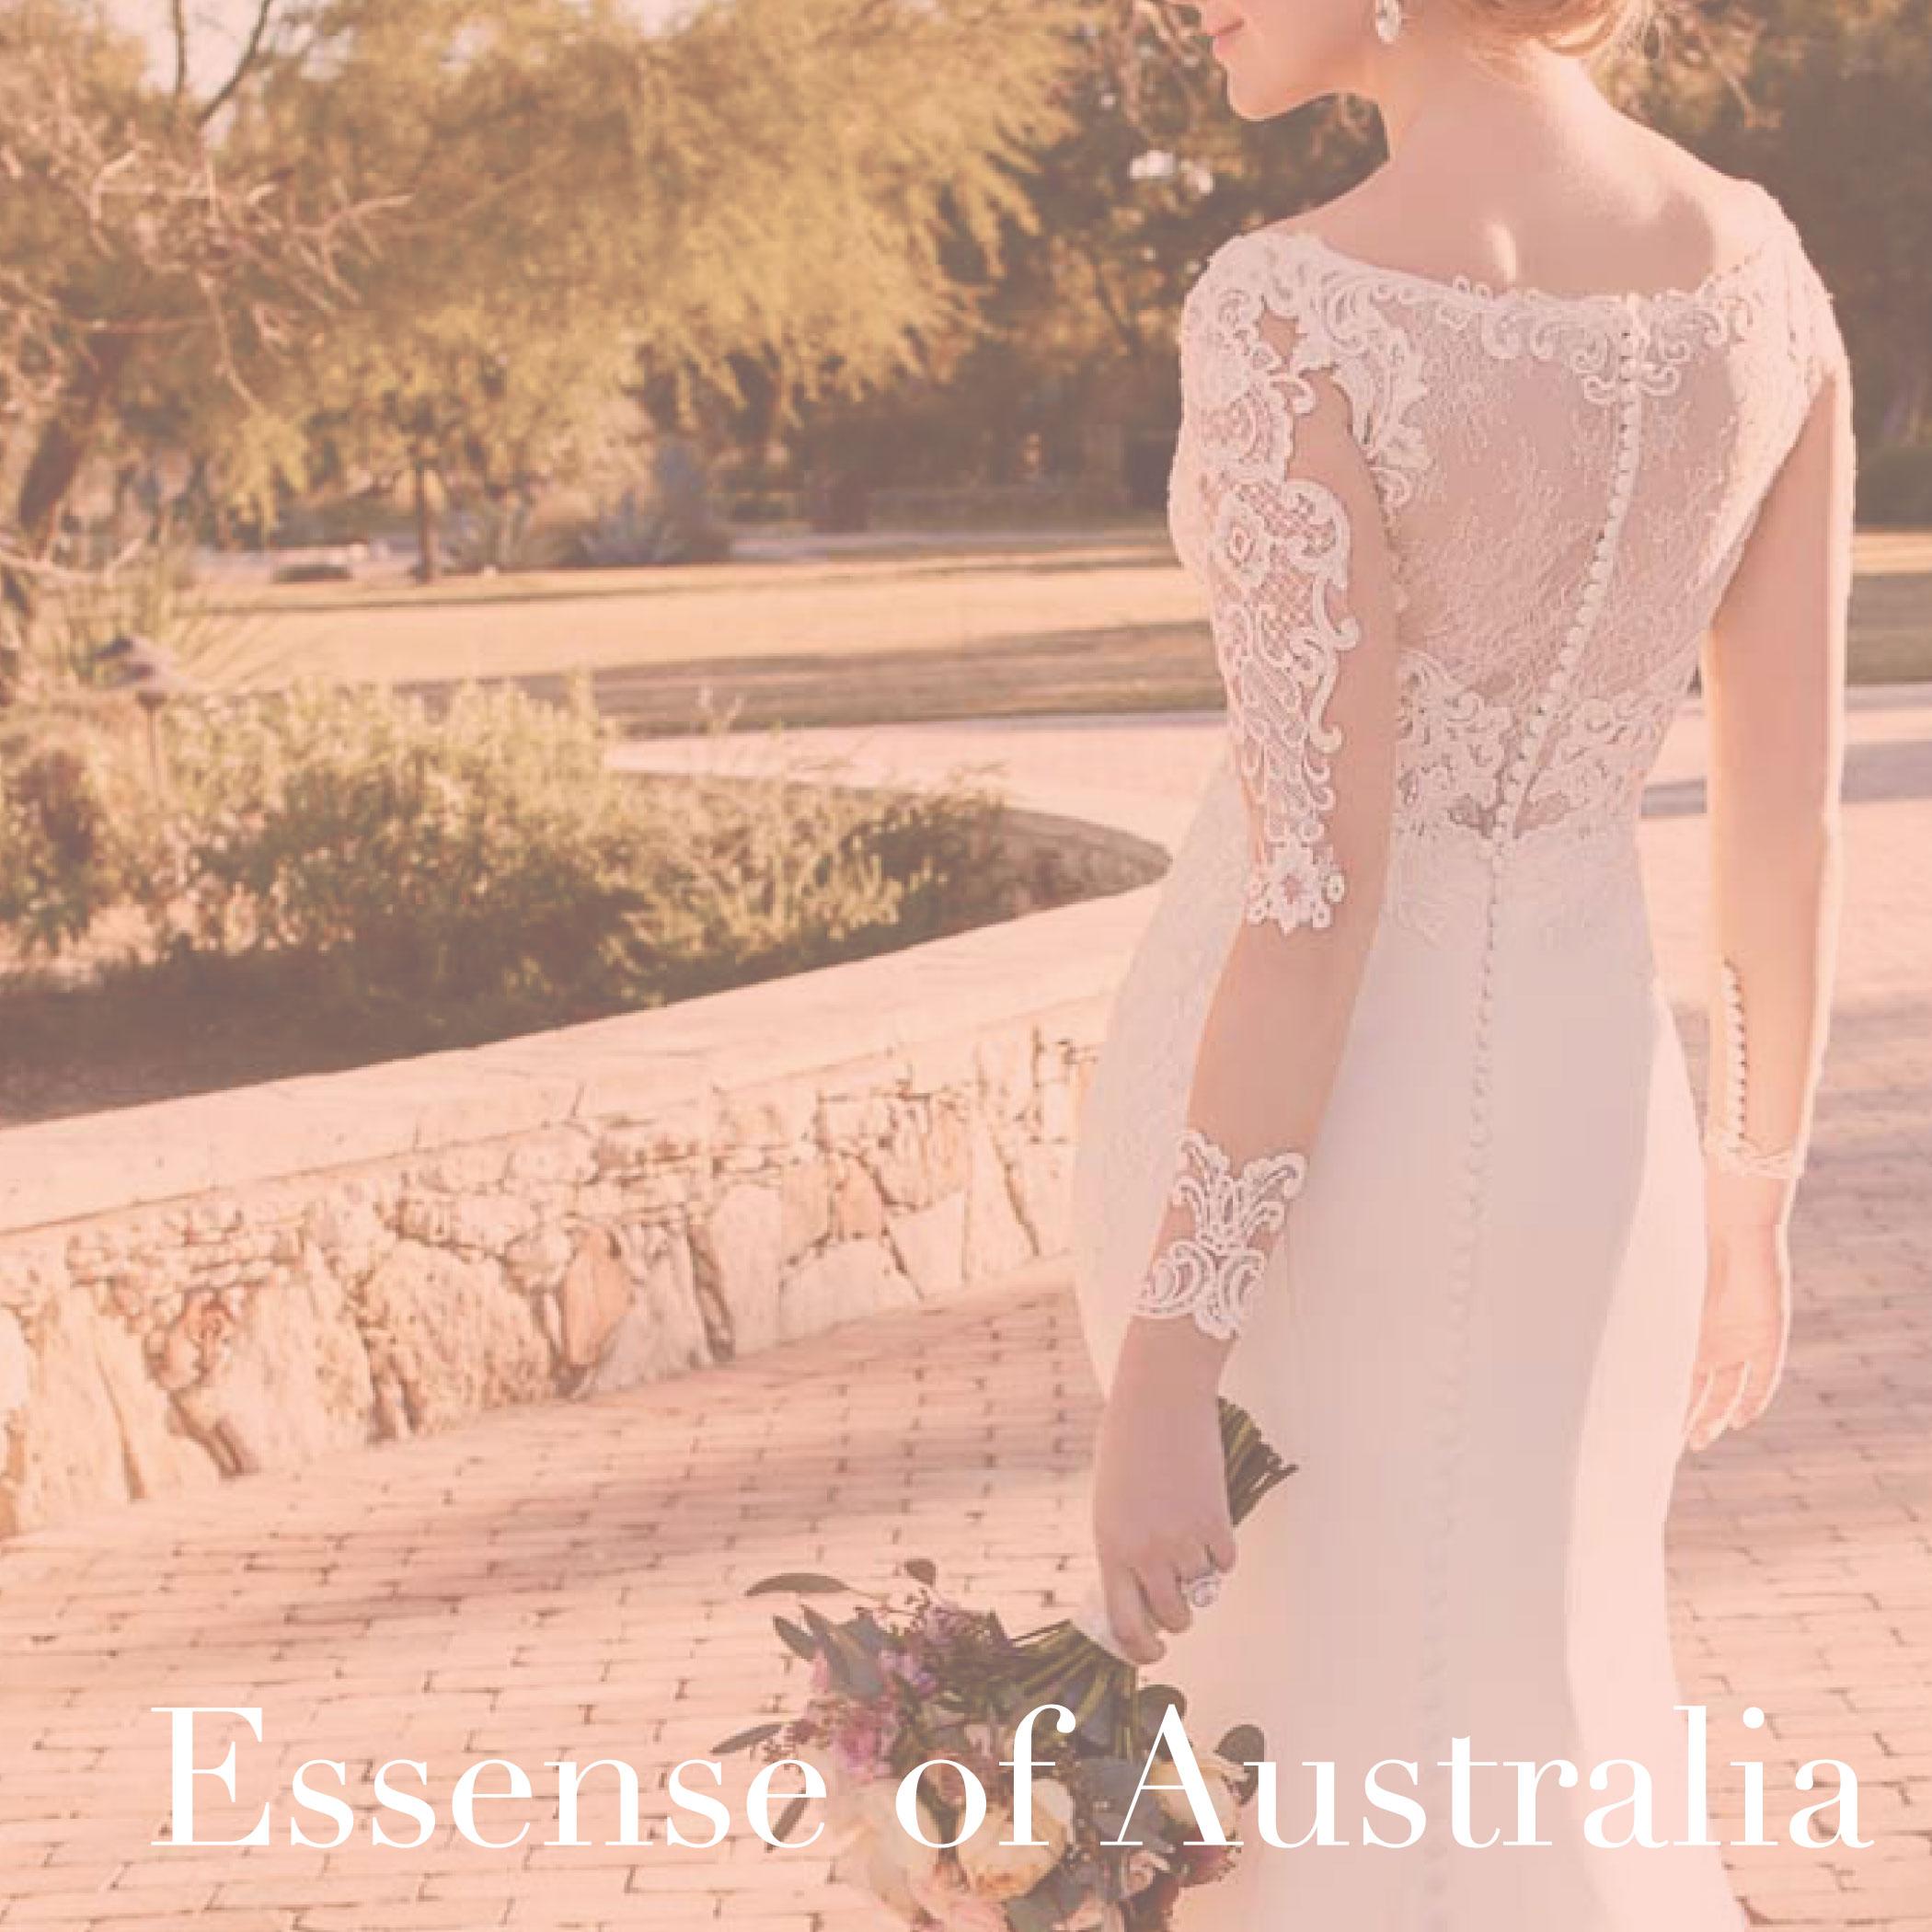 Essense of Australia.jpg